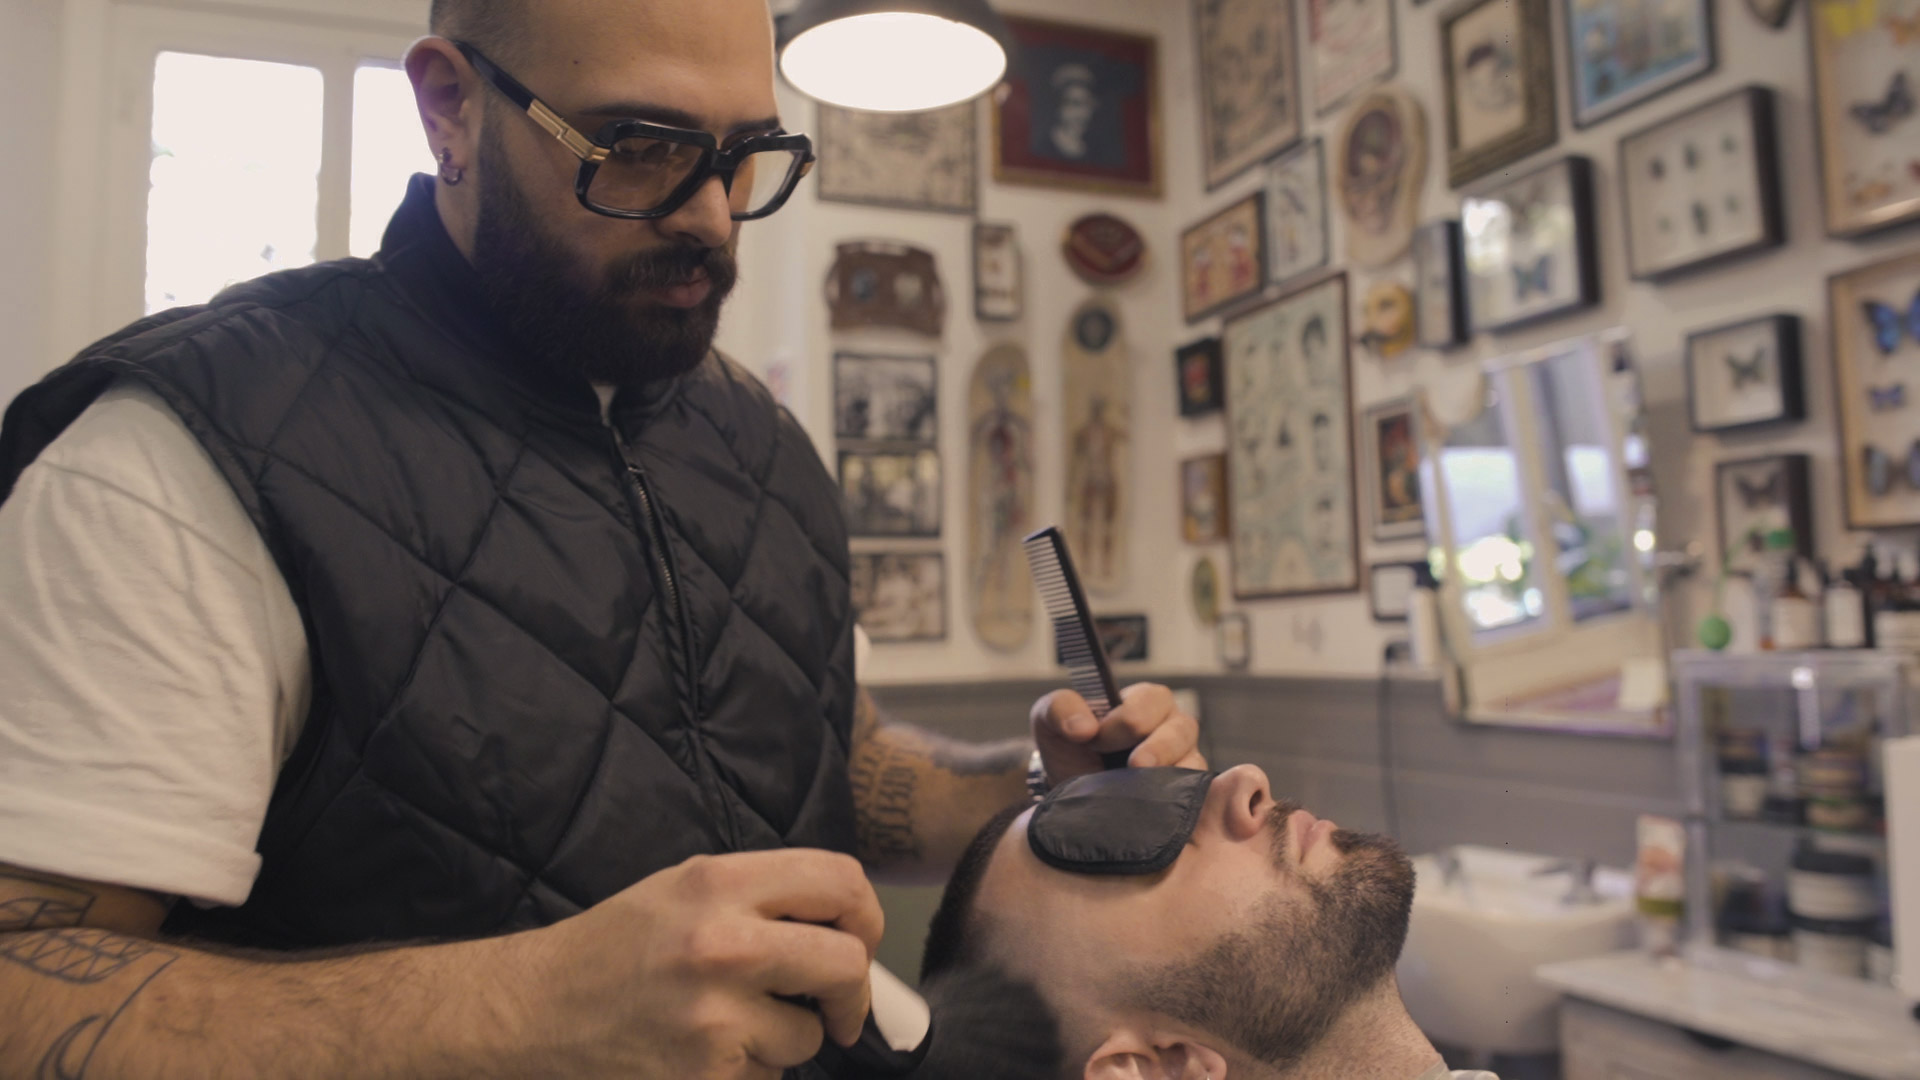 Barber's Chairs - Bullfrog Barbershop - Nicola Crocco 10